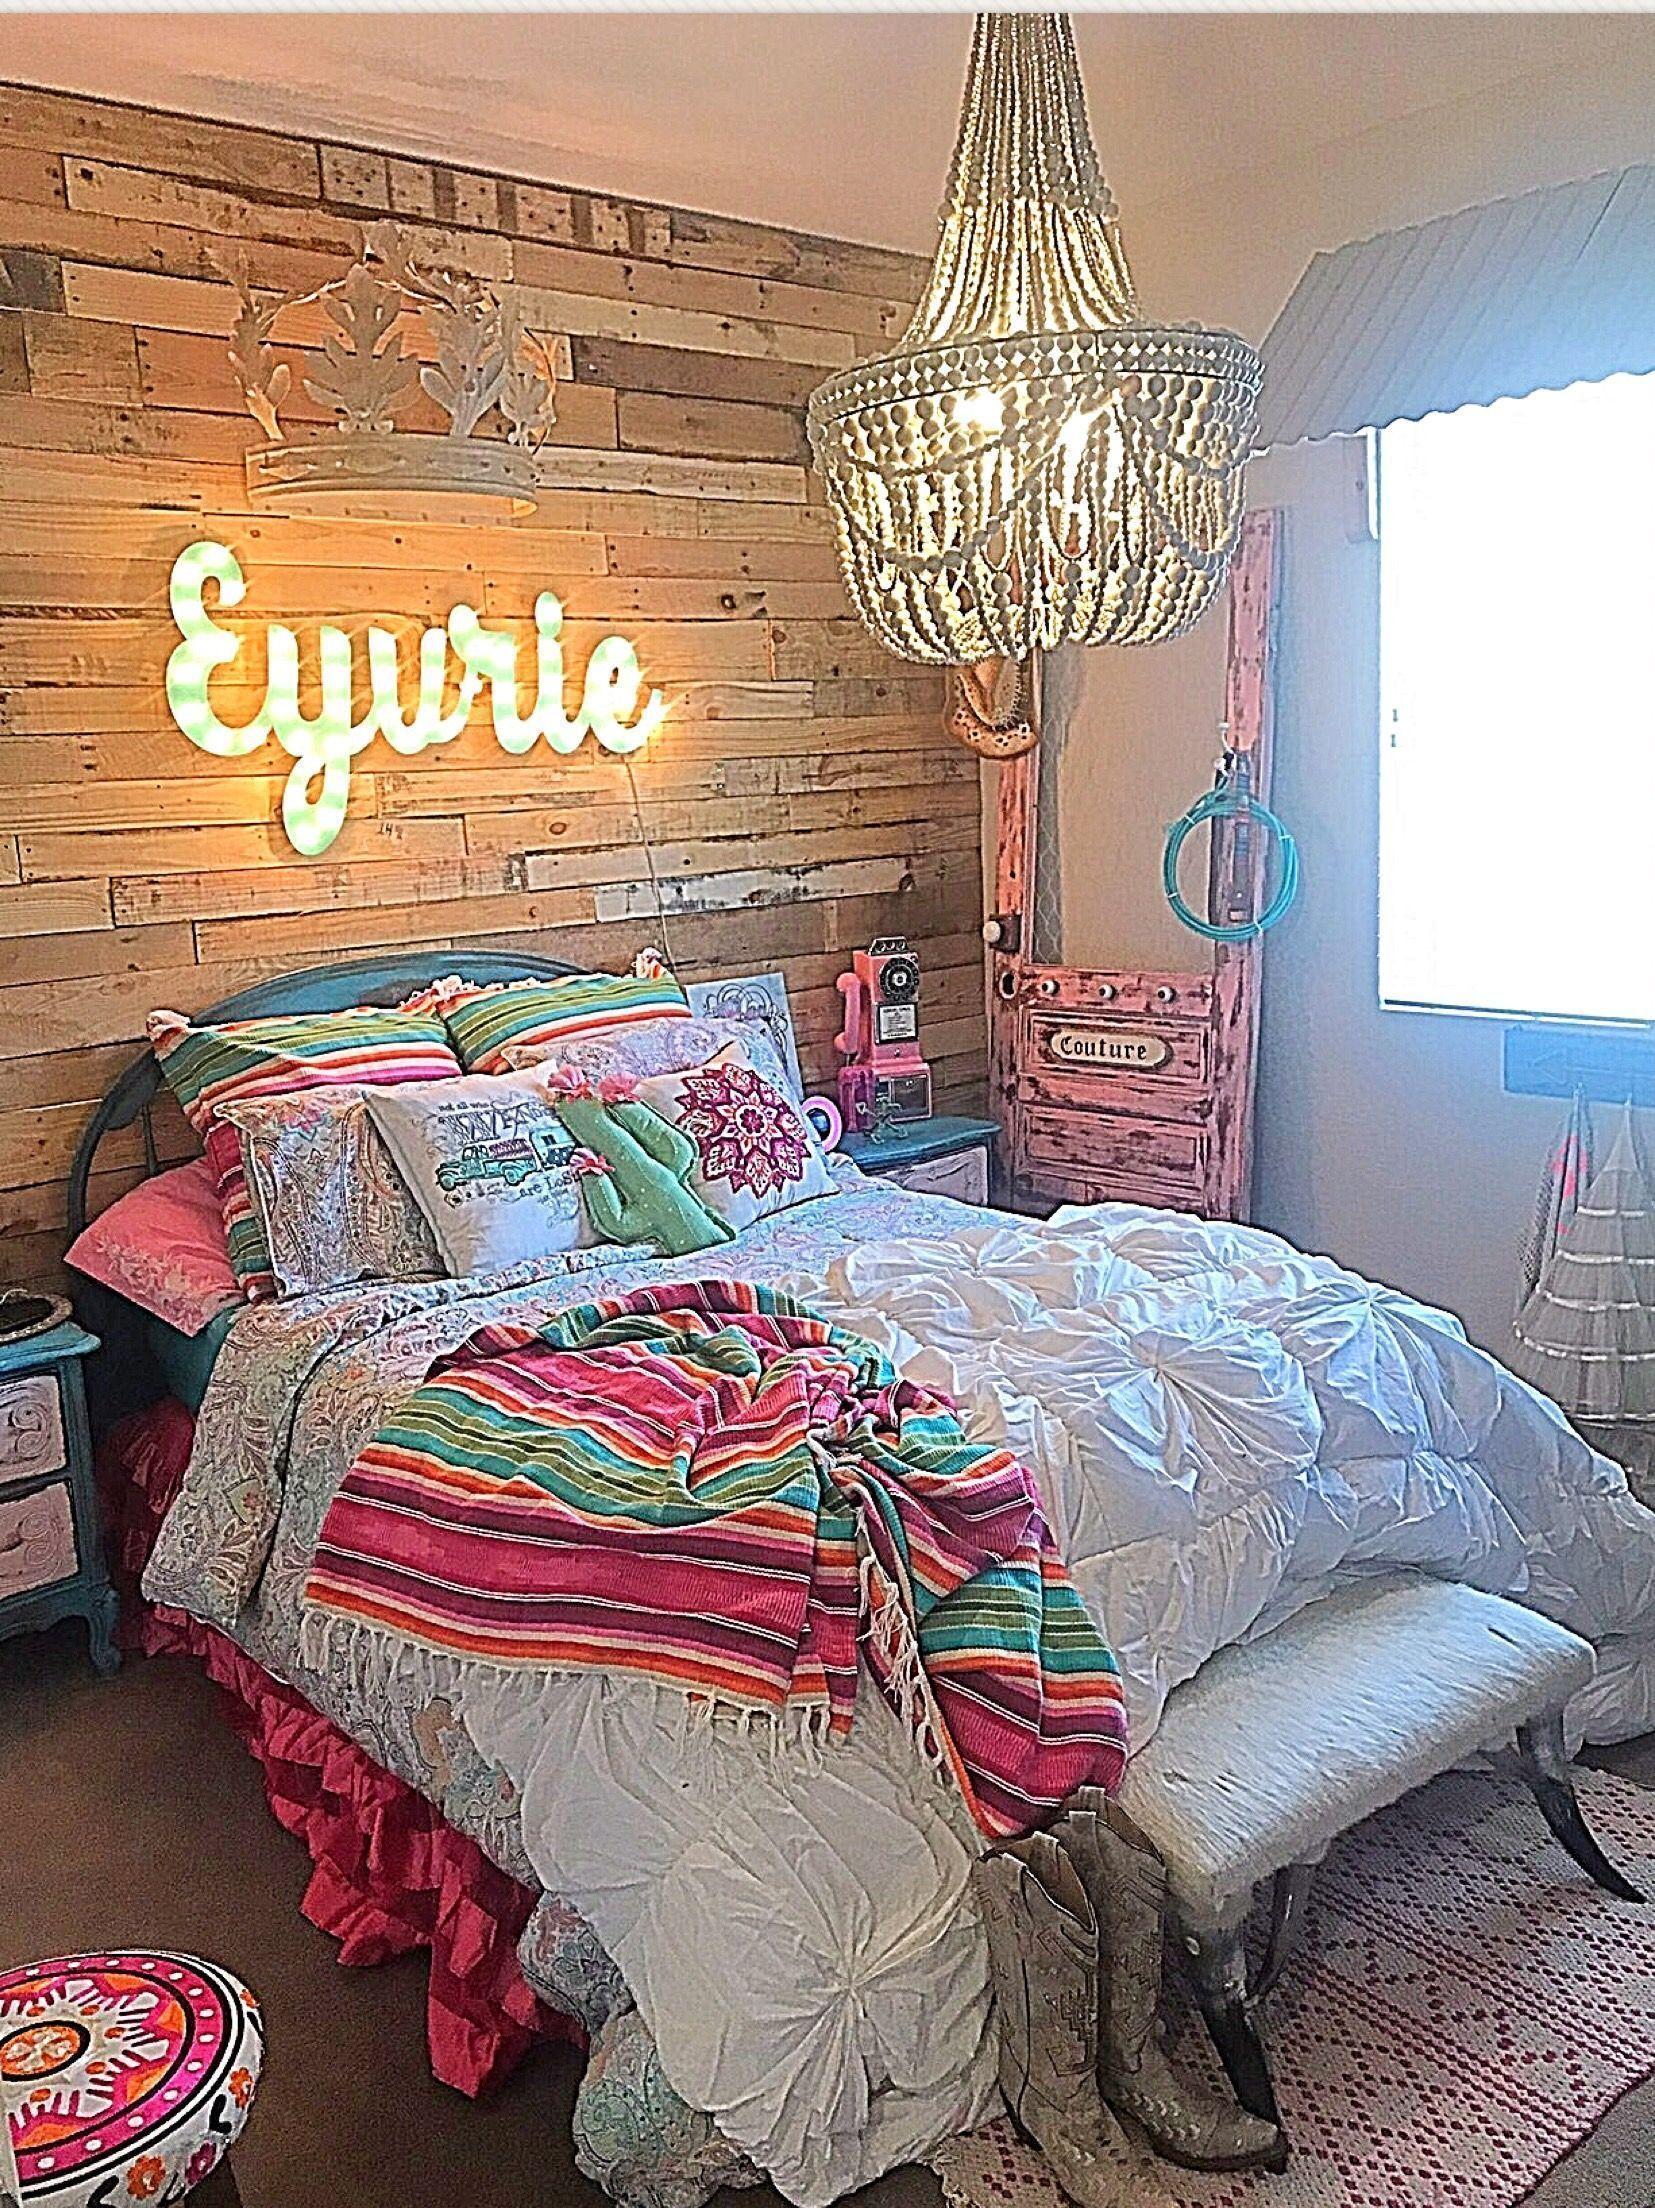 Junk Gypsy Theme Room By Designer Michele Velasco Of @Thefunkgypsy